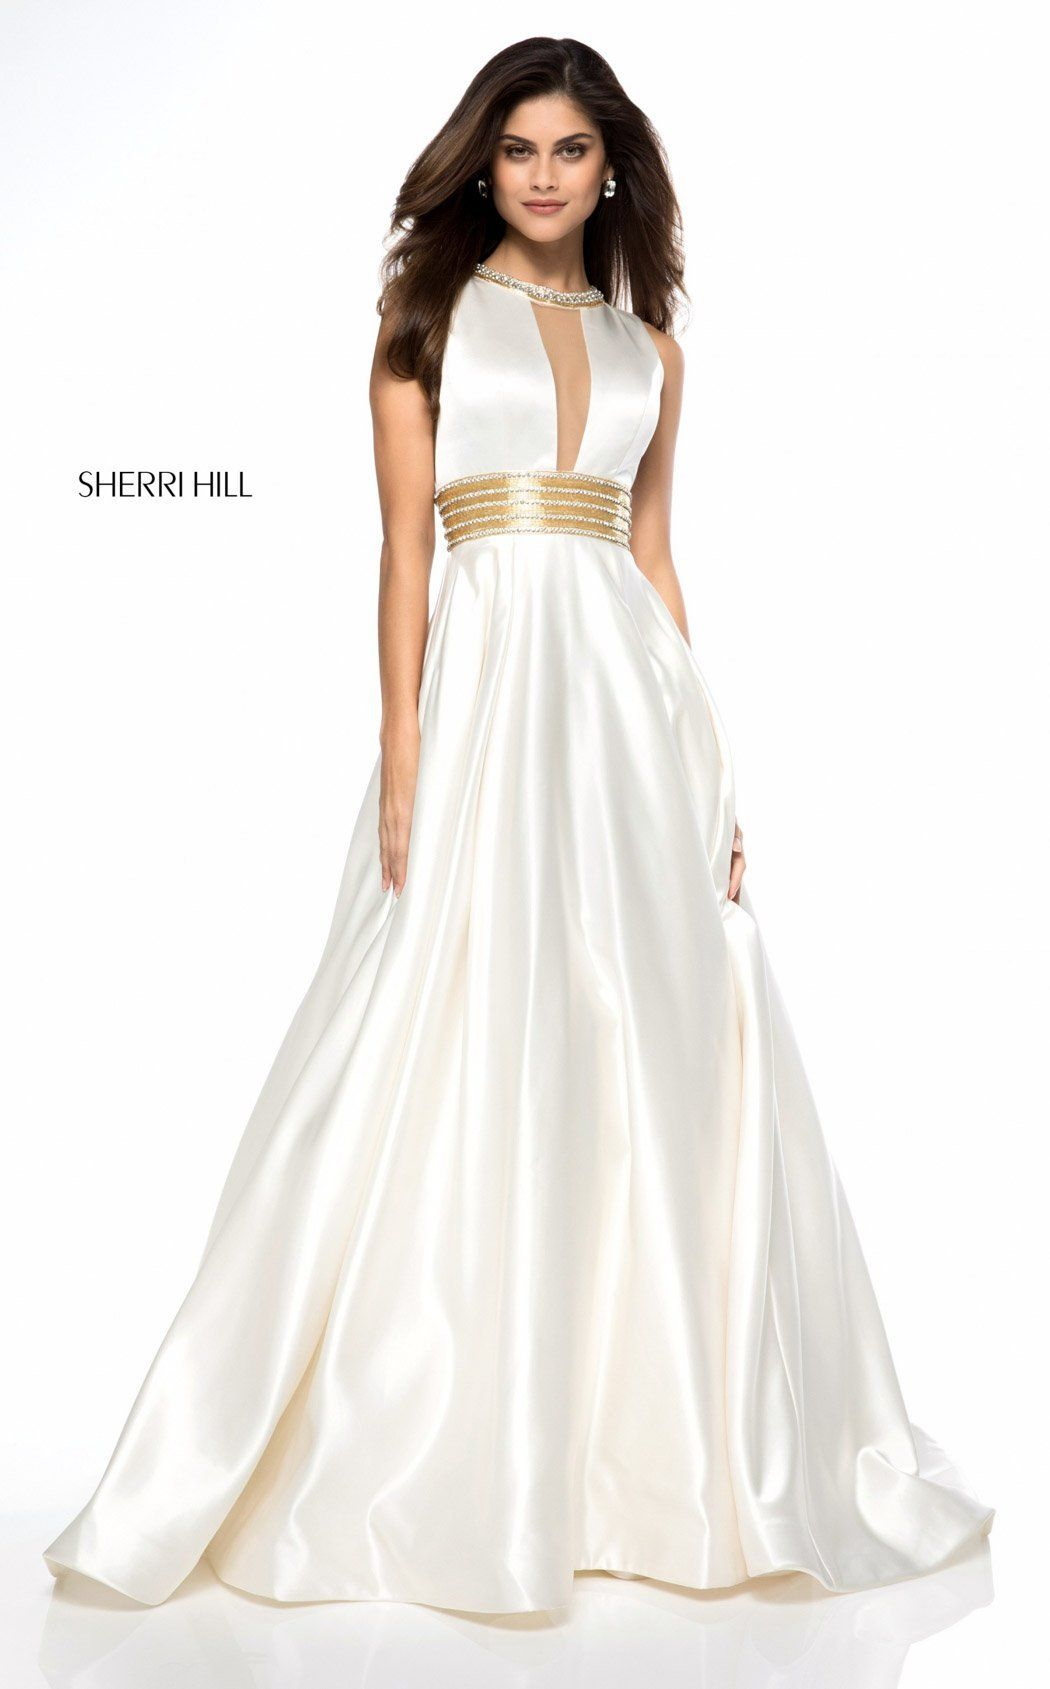 277add20edd9 Sherri Hill - Official Site of Designer - Prom Dresses - Couture Dresses